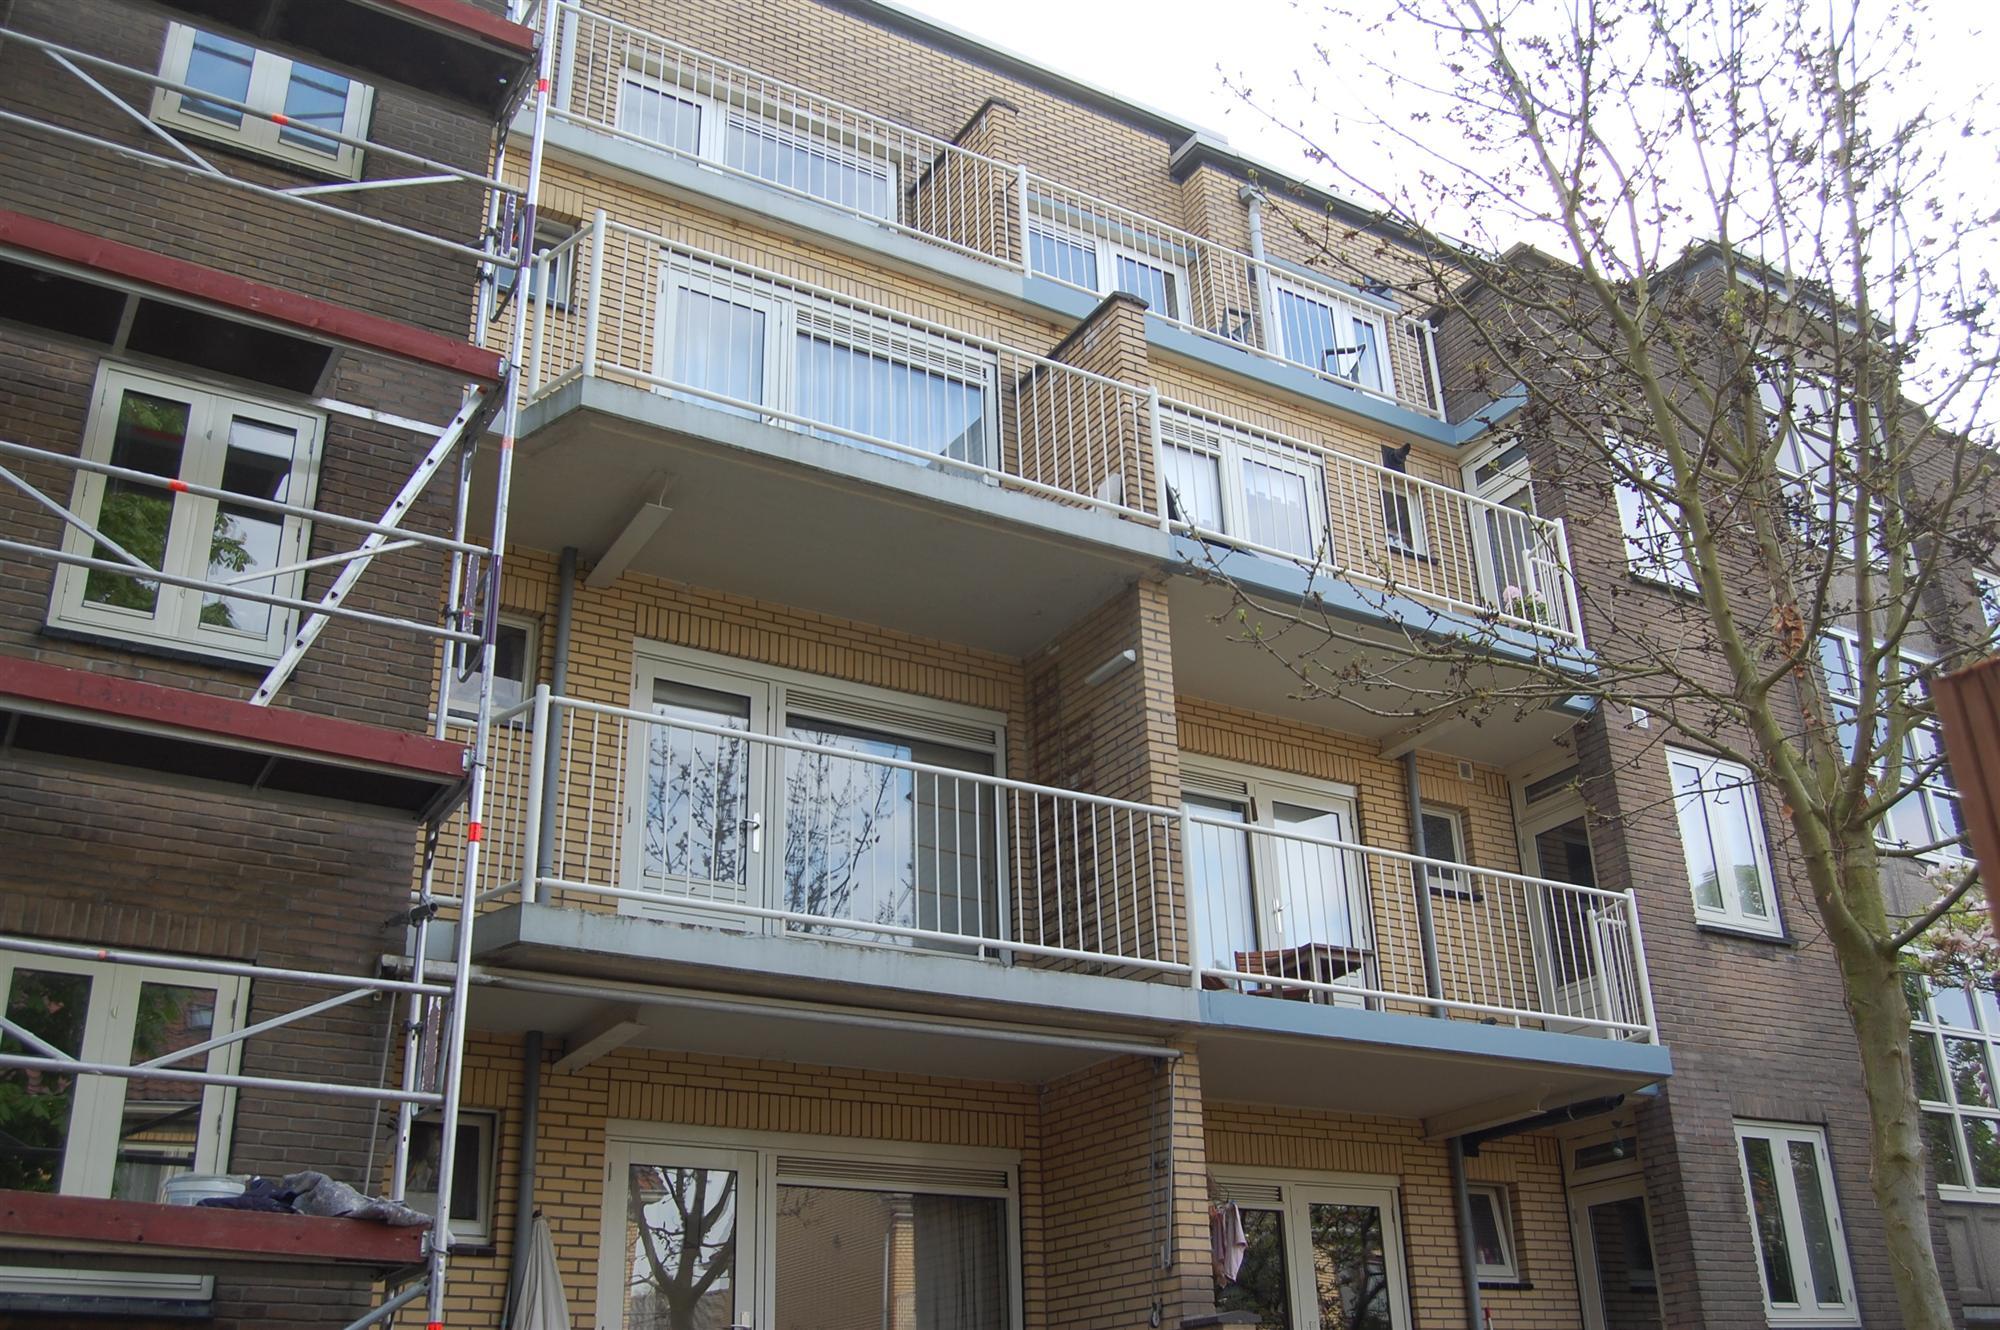 balkons-achterzijde